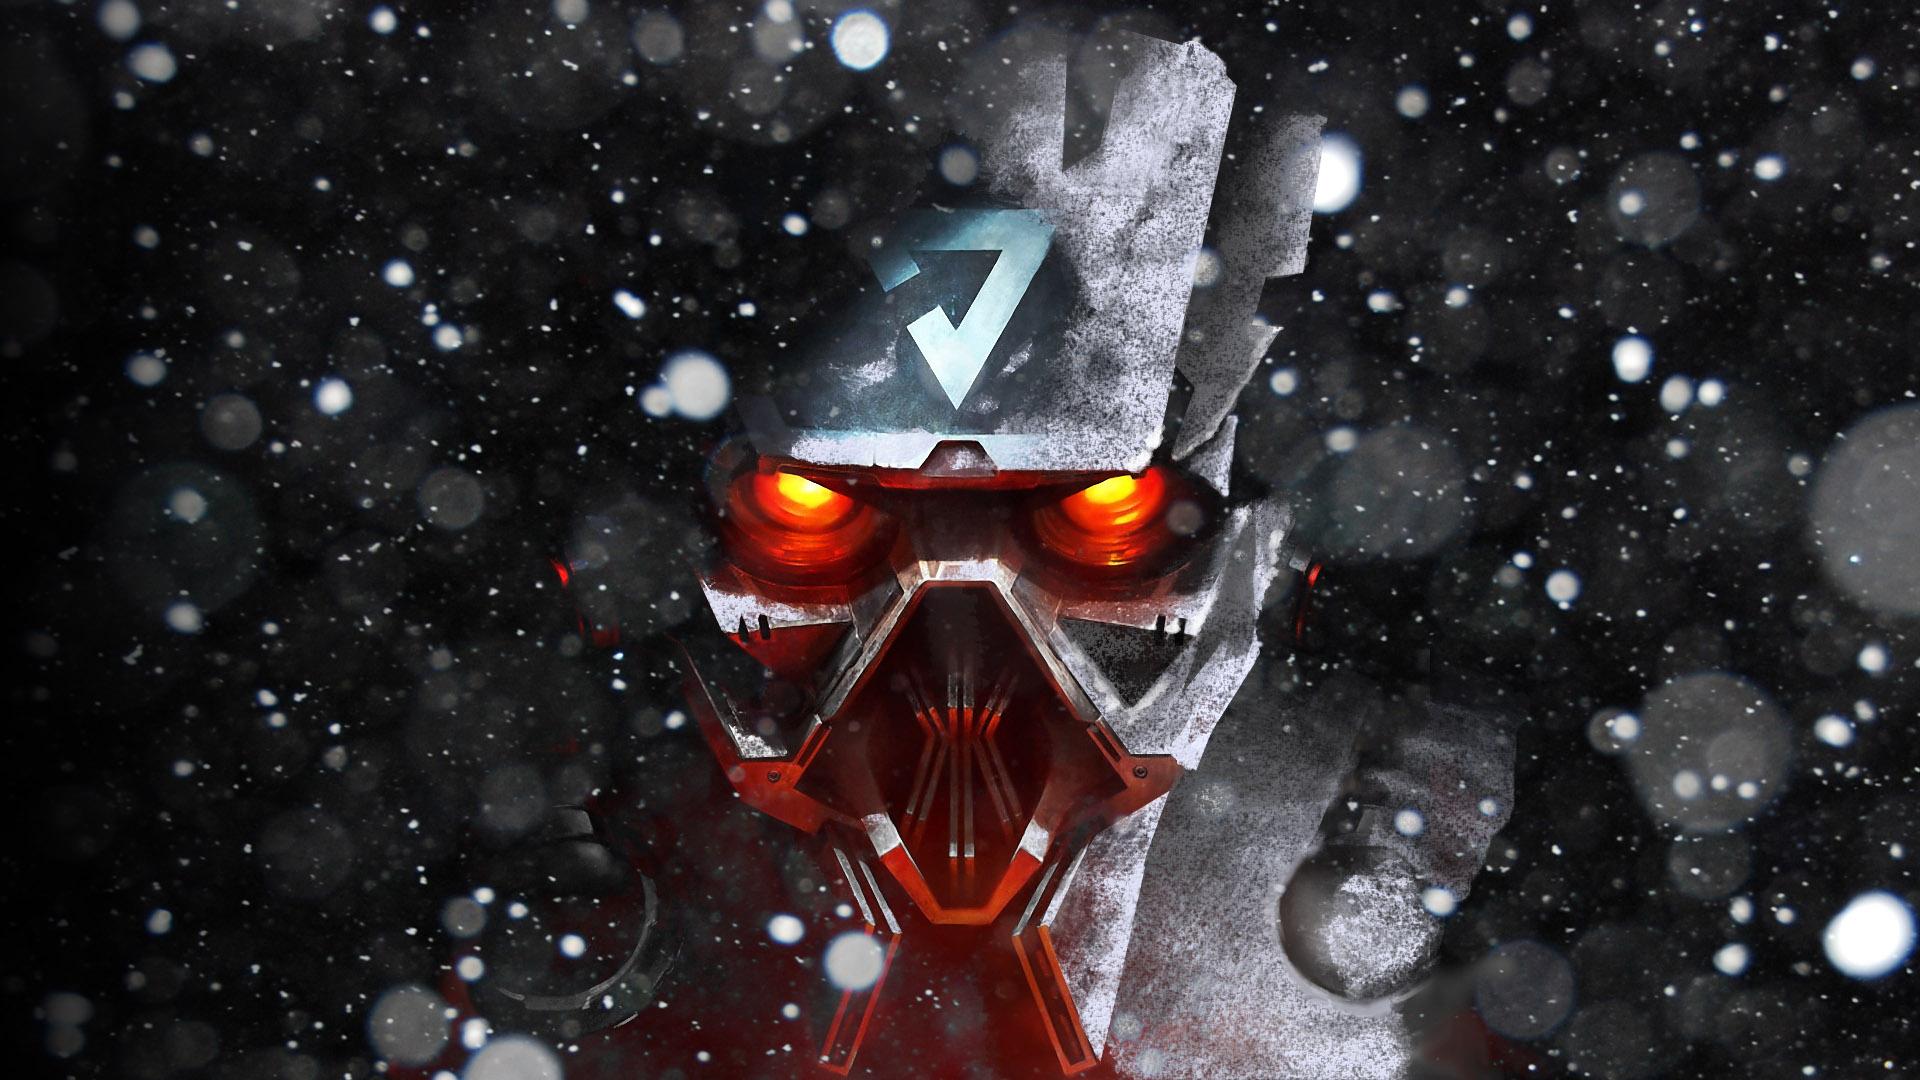 Killzone 4 Wallpaper